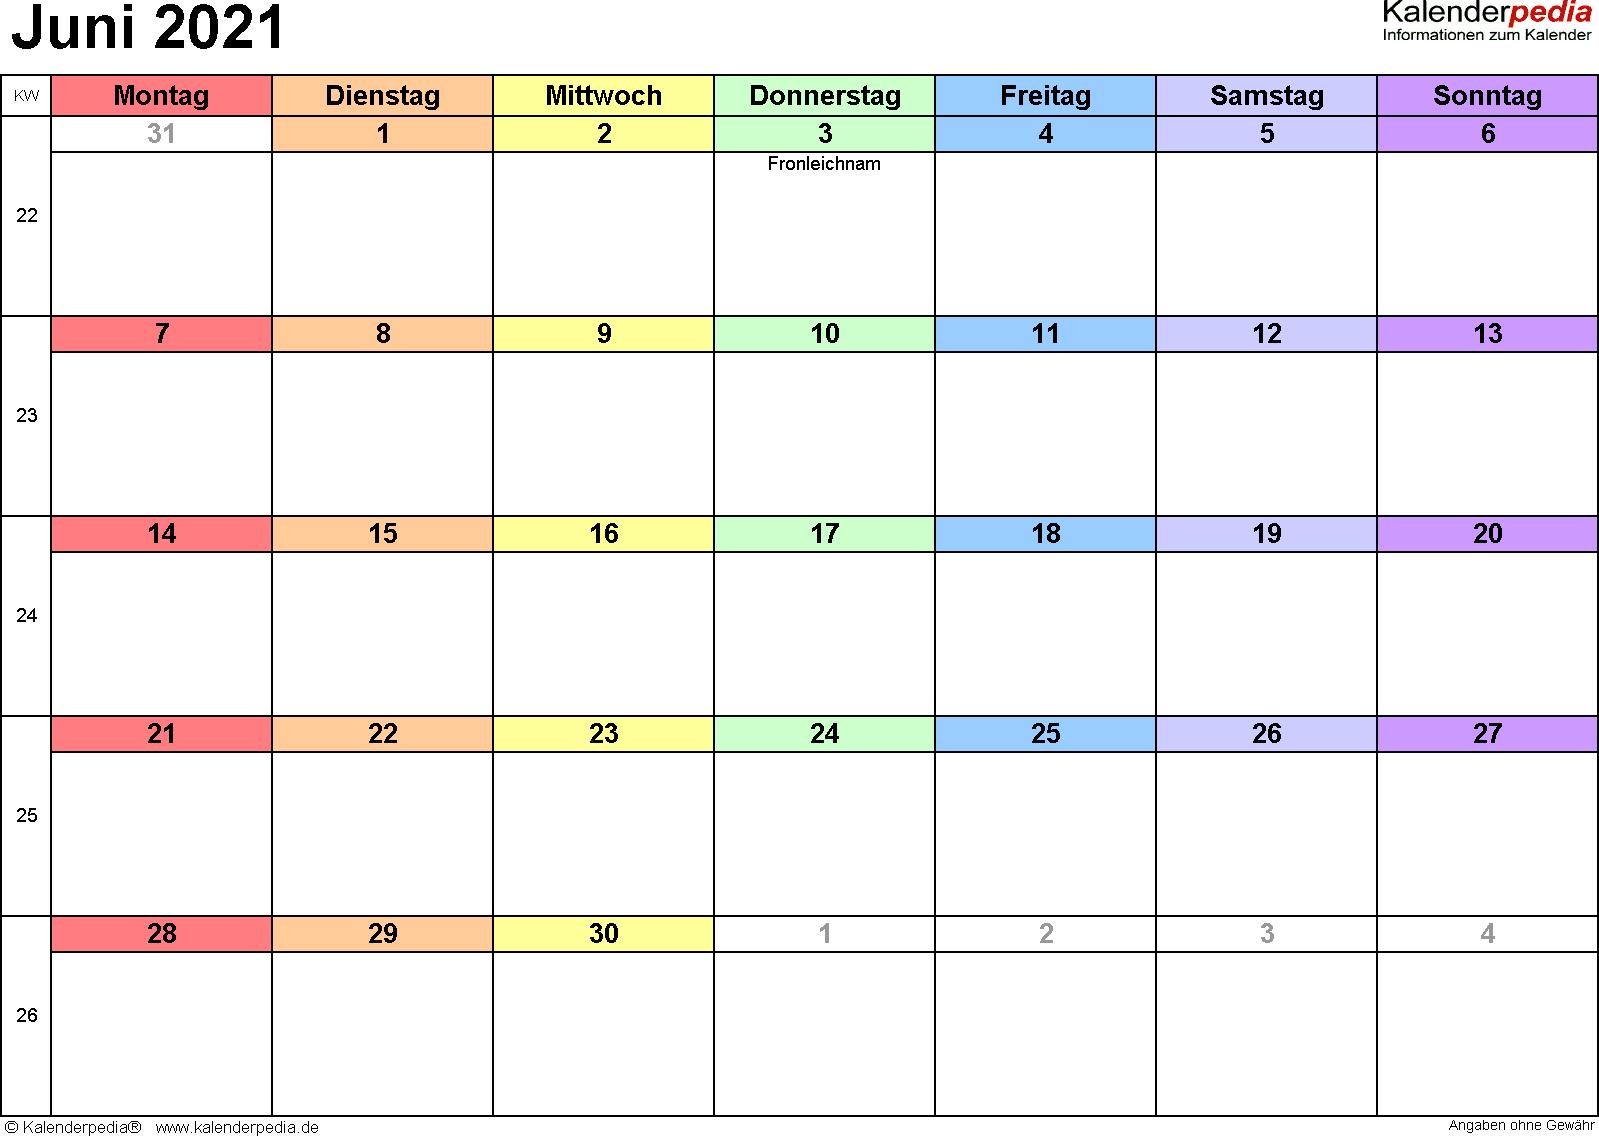 Kalender Juni 2021 (Querformat) als Excel-Vorlage